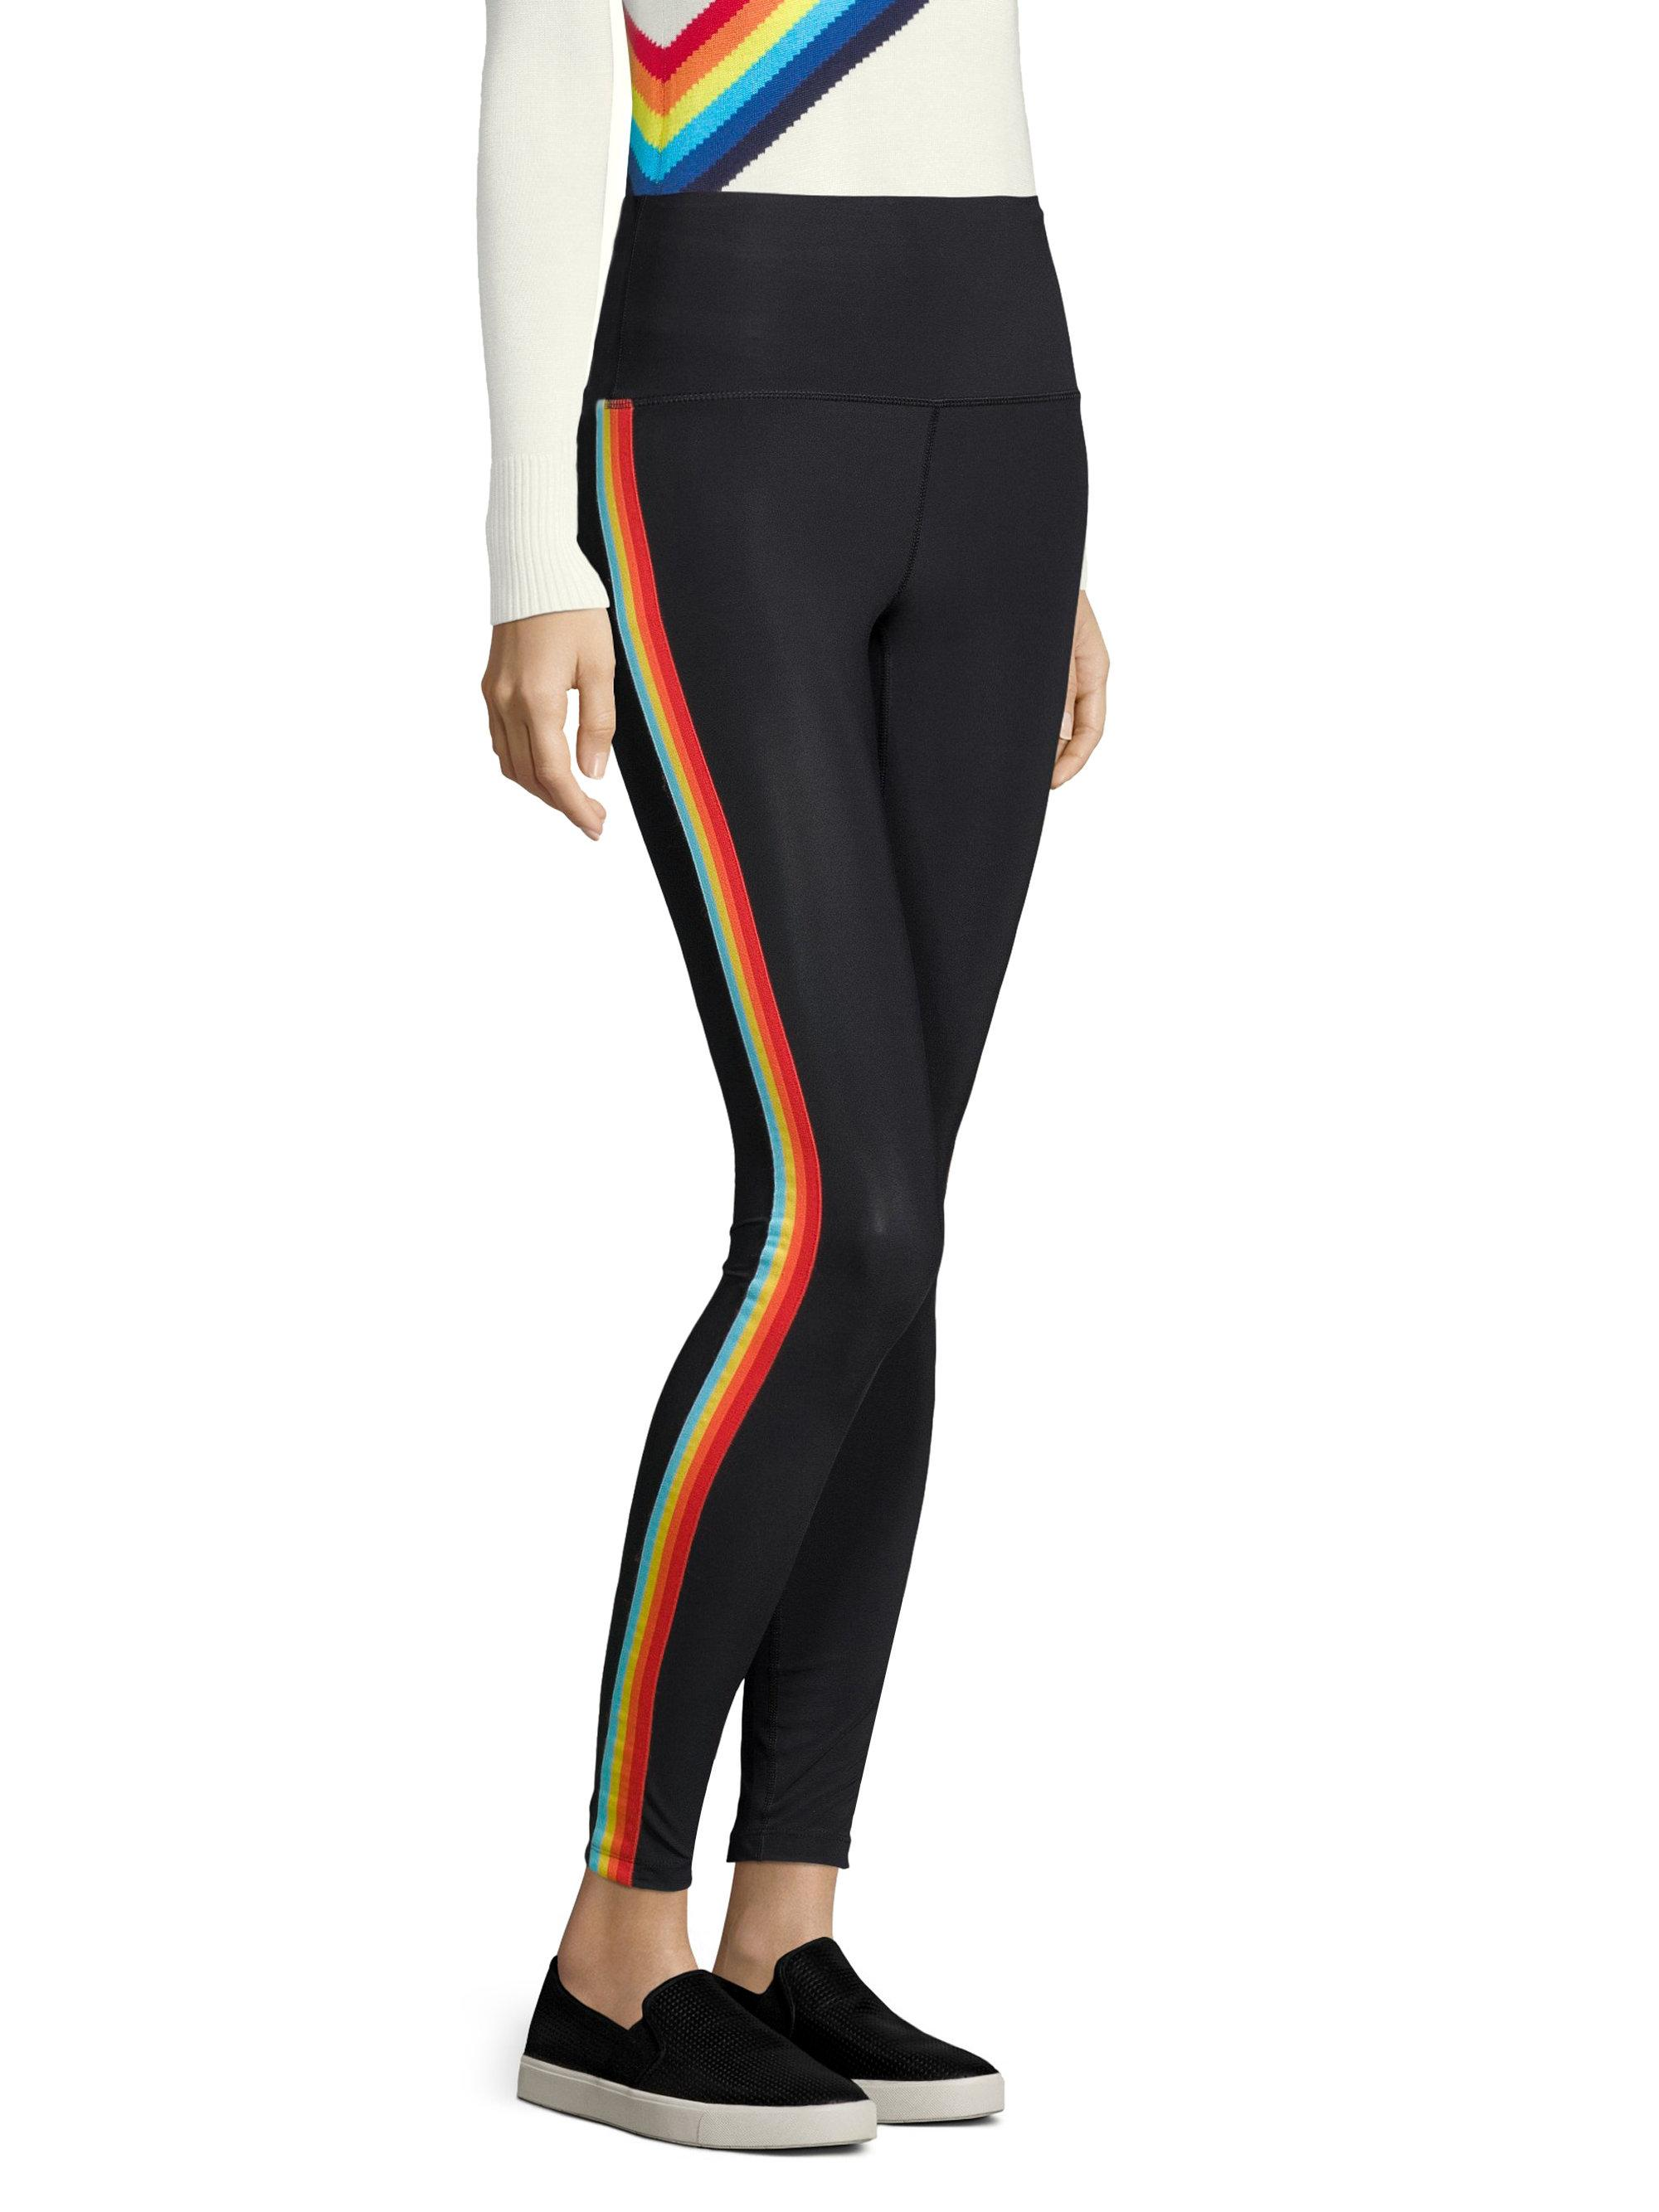 55f3be68508bc Spiritual Gangster Rainbow Striped Leggings in Black - Lyst